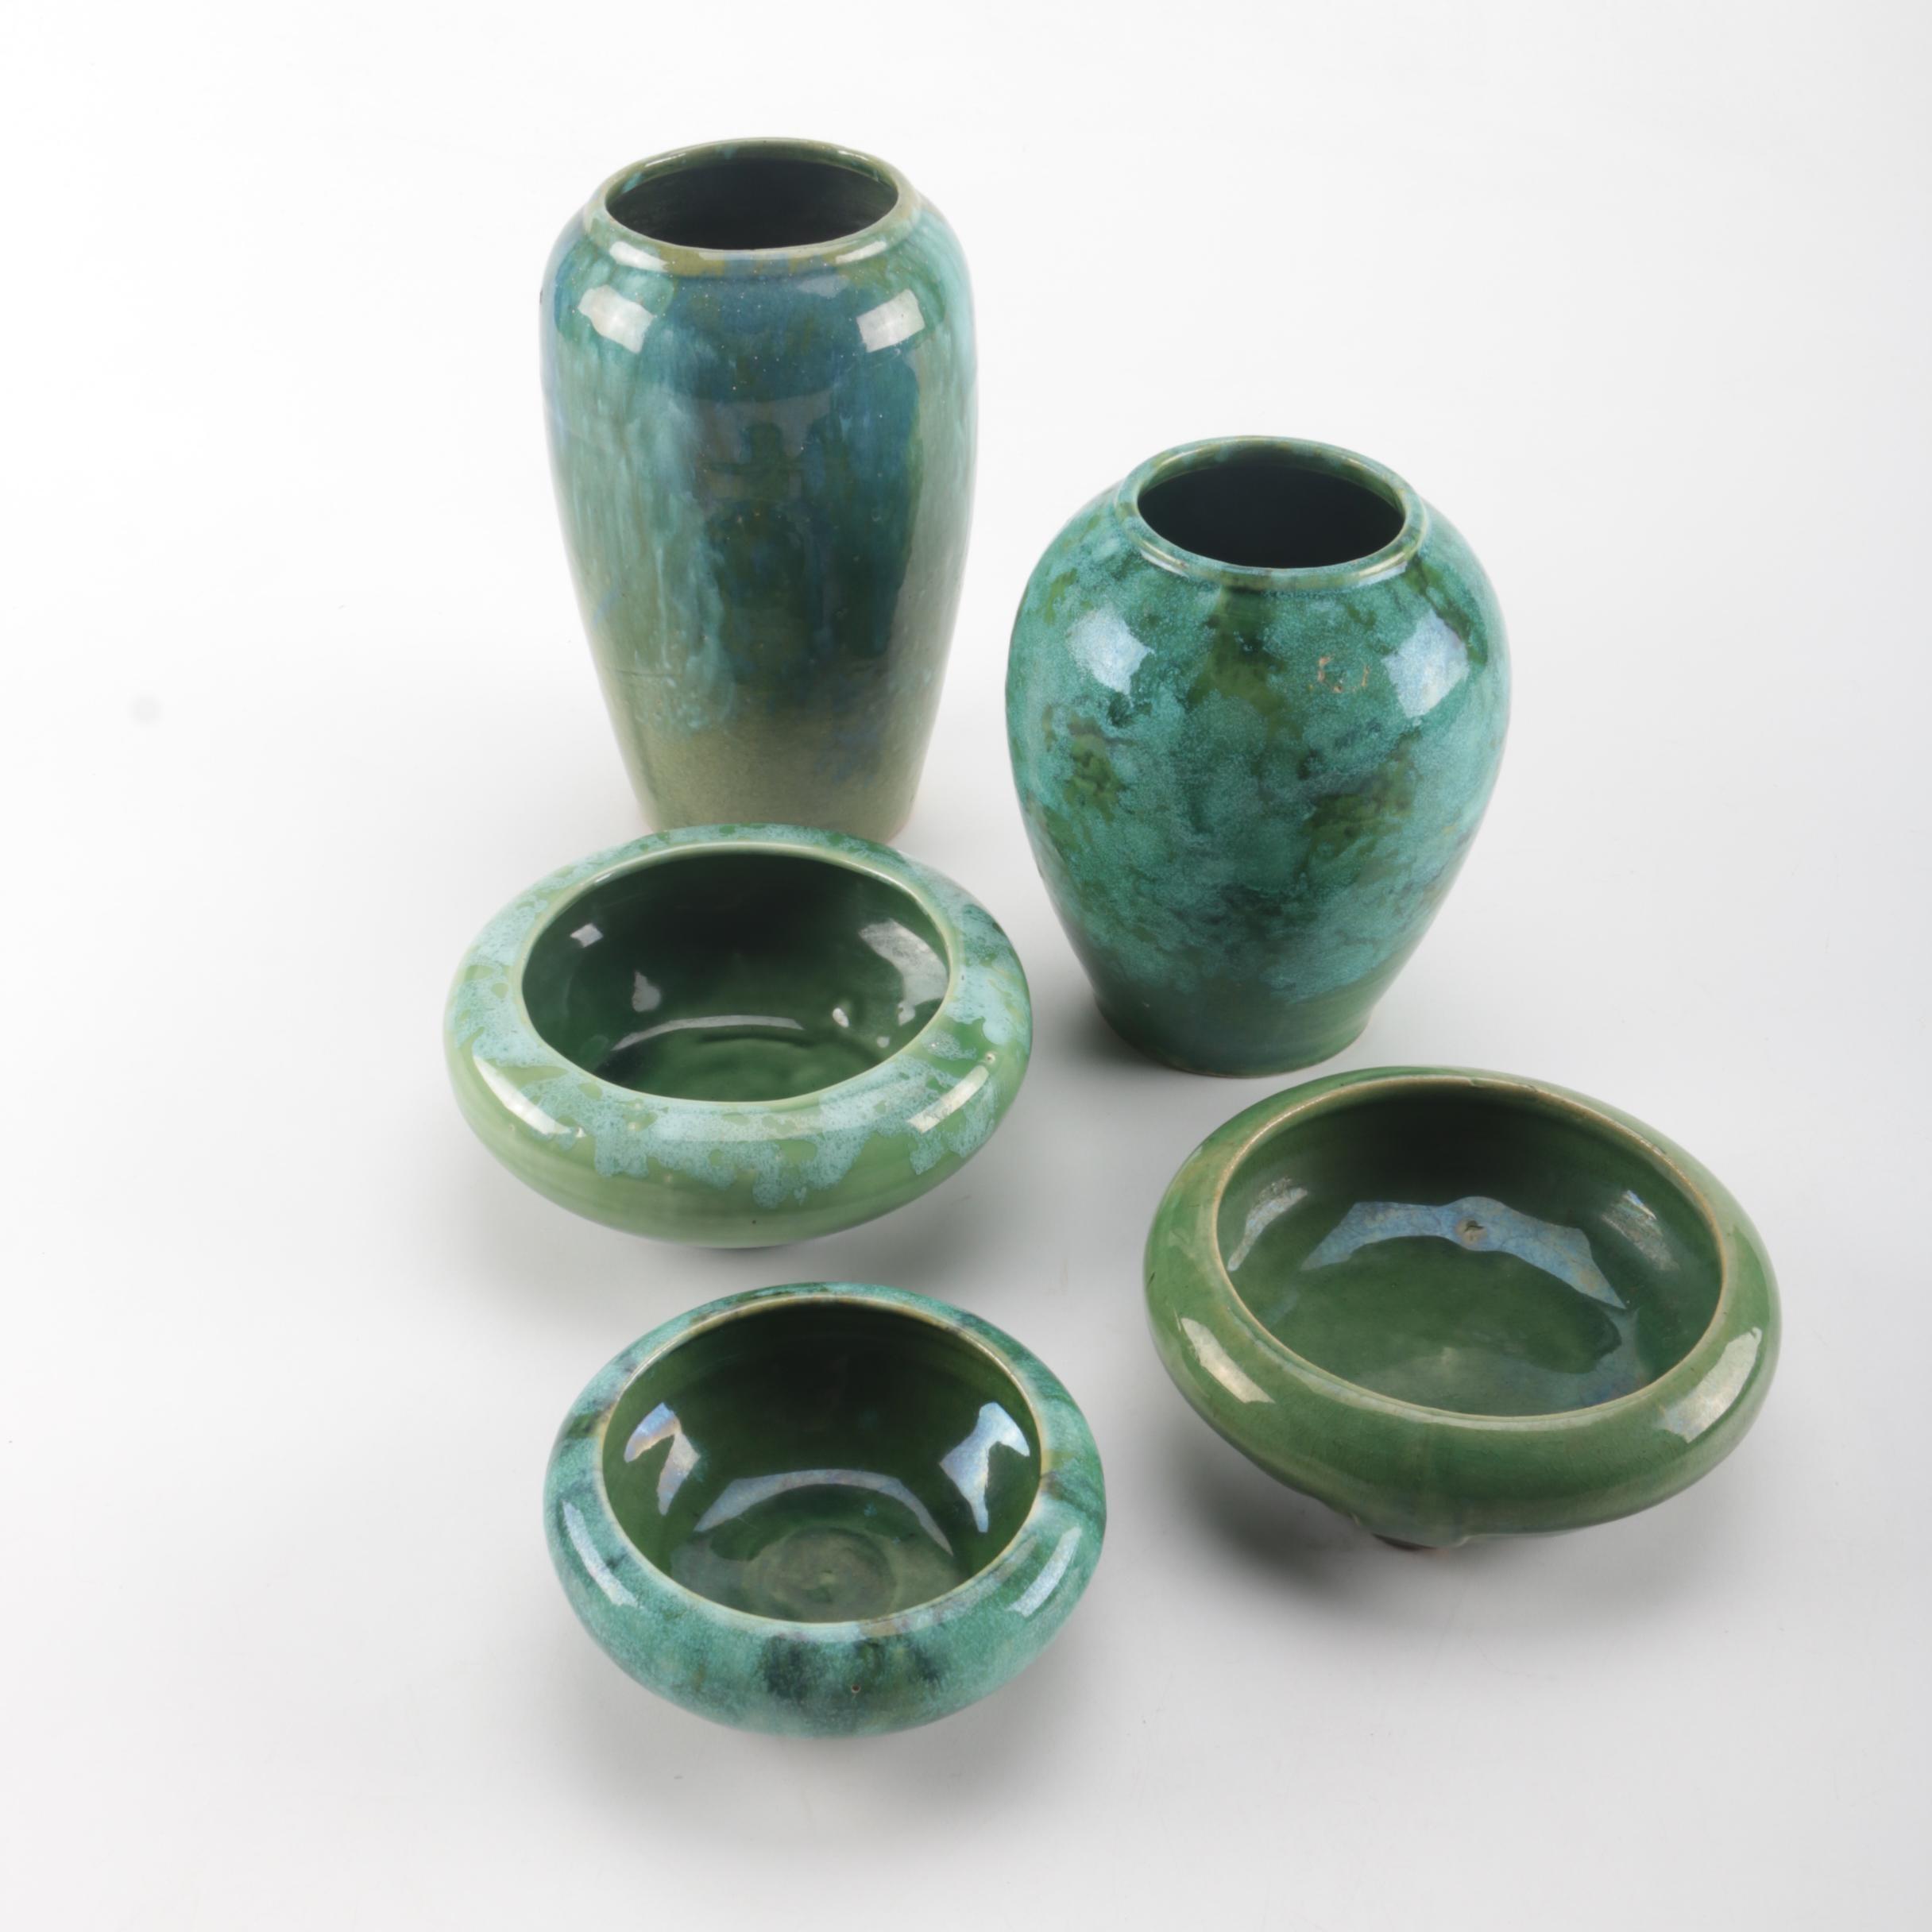 Set of Green Ceramic Vases and Ceramic Trinket Bowls